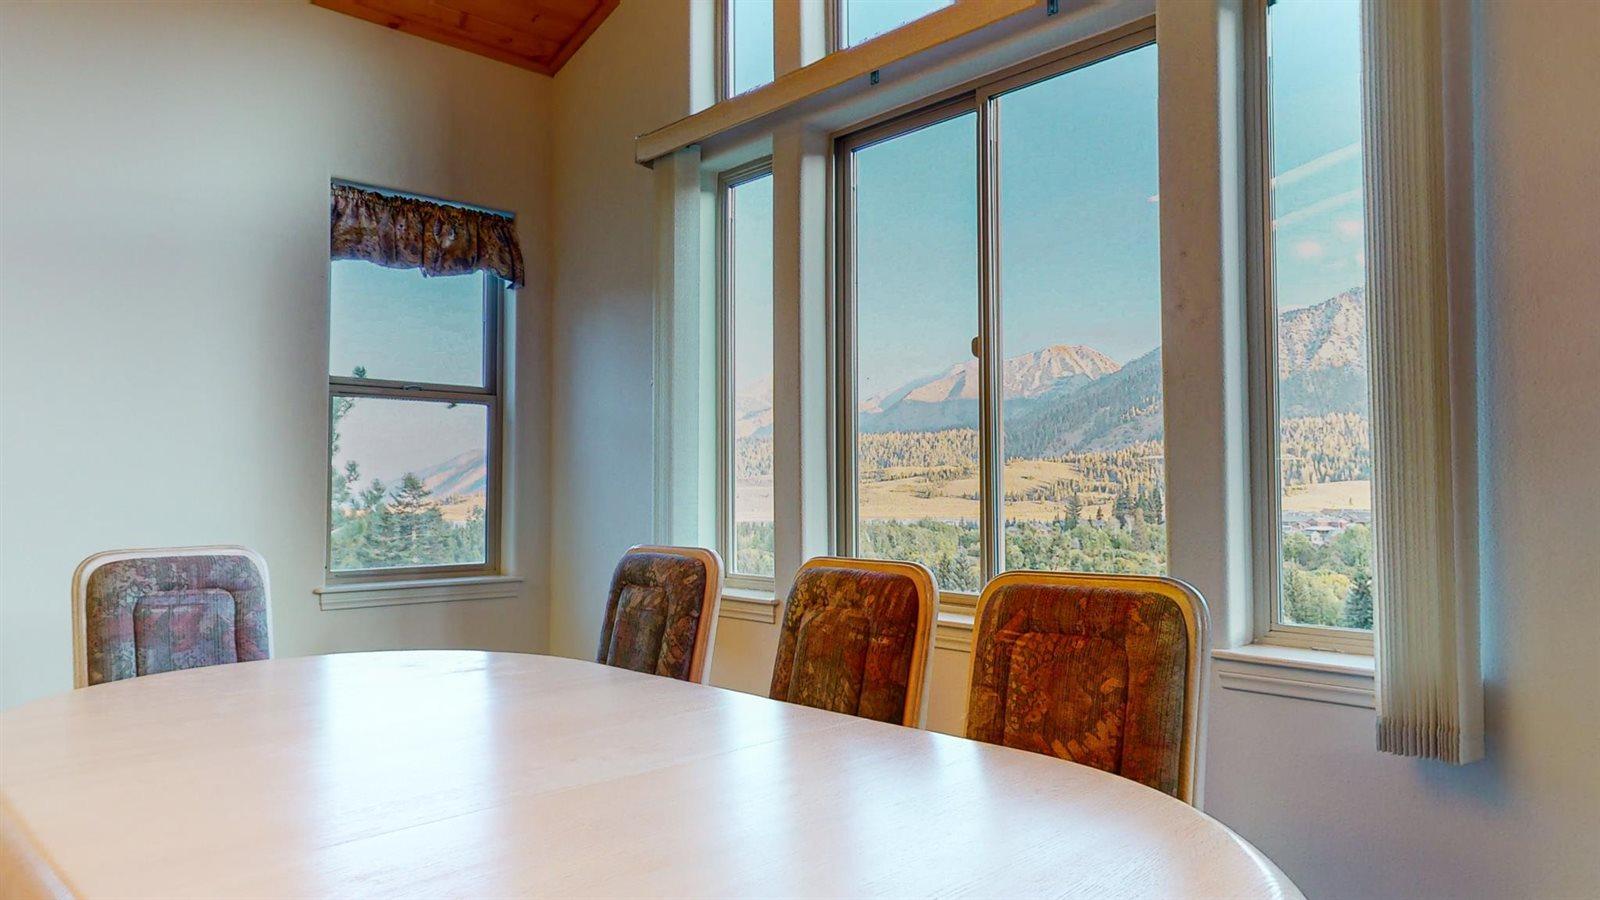 77 Panorama Drive, Mammoth Lakes, CA 93546